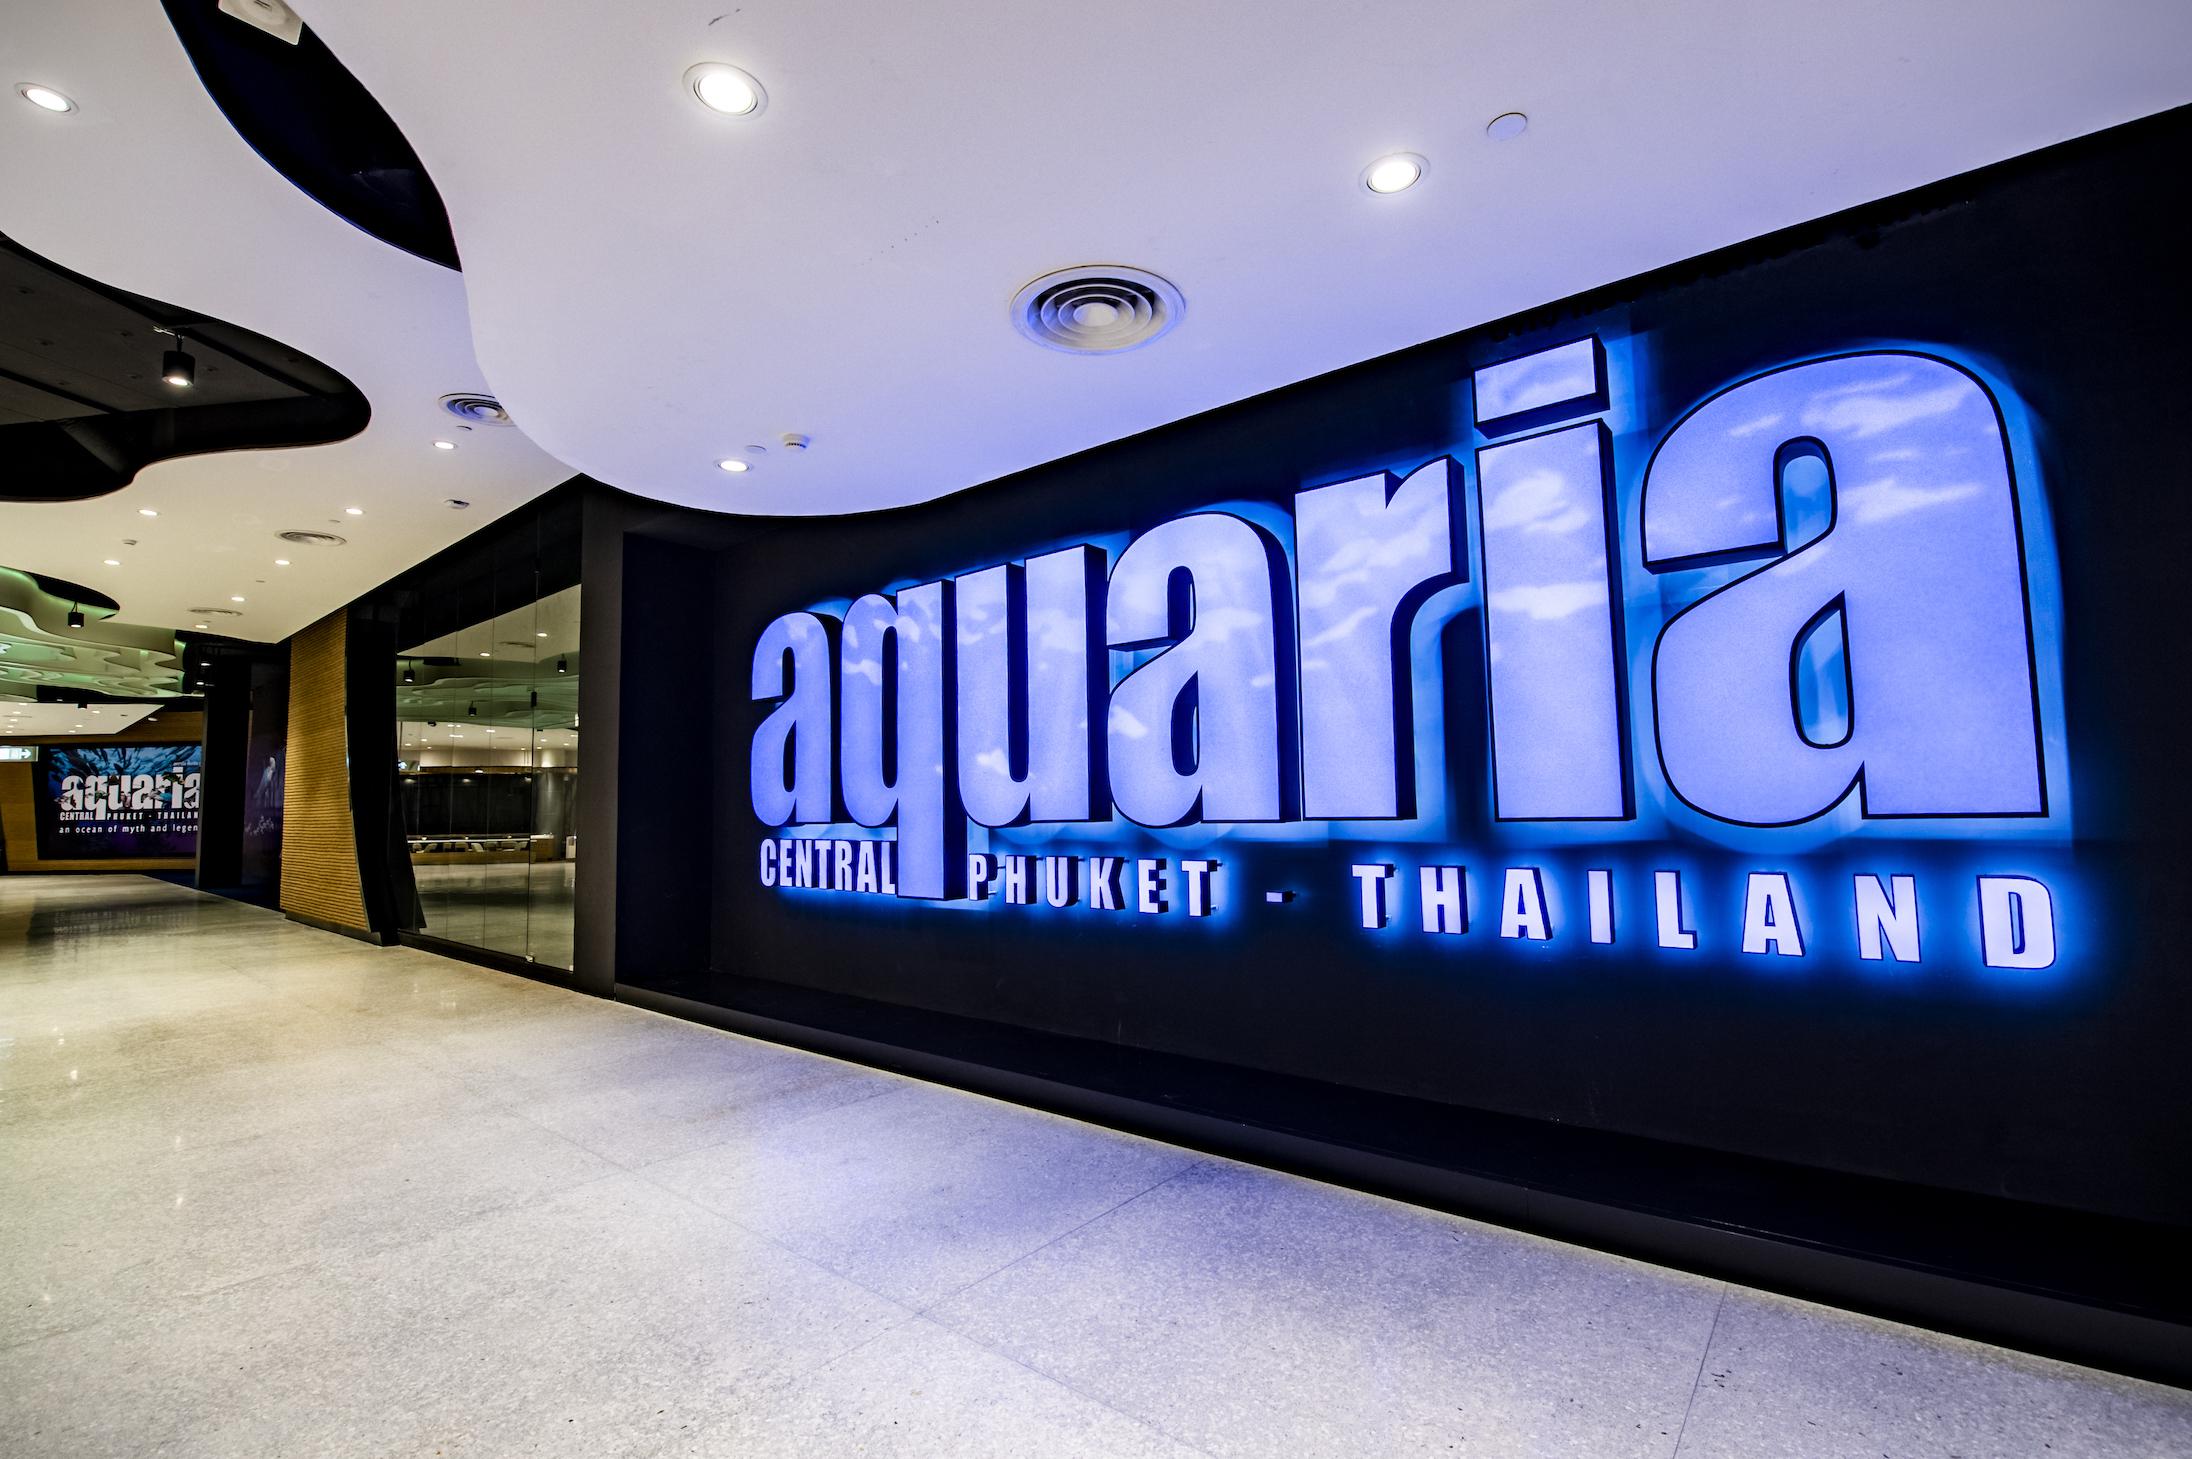 aquaria cental festival phuket -